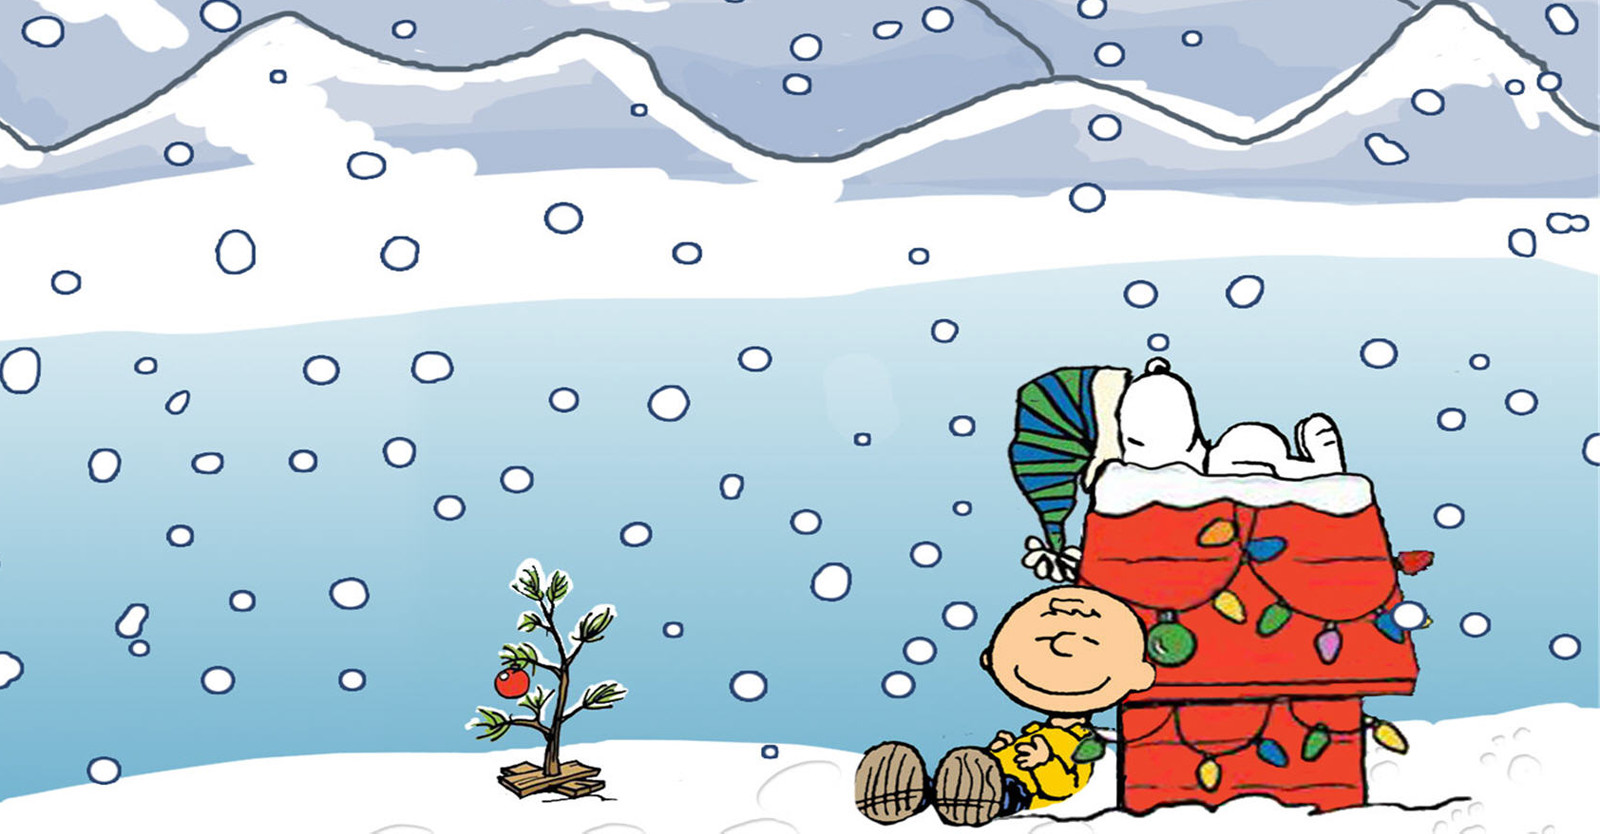 Charlie-Brown-Christmas-with-snow